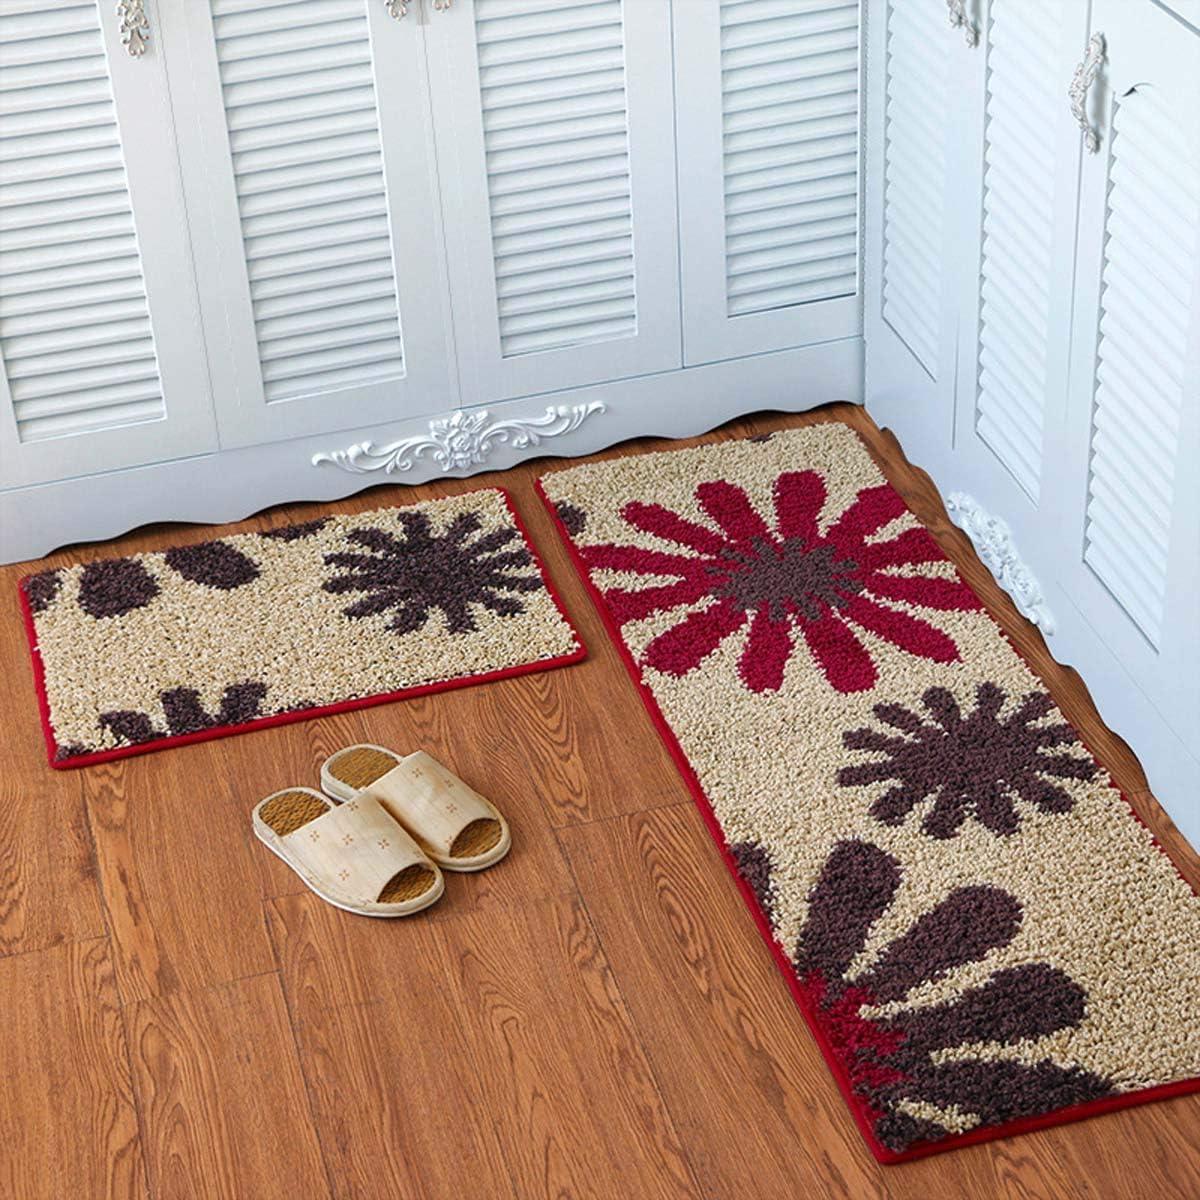 Rose Red 15.7 x 23.6+15.7 X 47 Jizzr 2 Pieces Microfiber Kitchen Floor Mat Set Non-Slip Floral Flower Printed Kitchen Rugs Soft Bathroom Runner Rug Doormat Carpet for Home Decoration